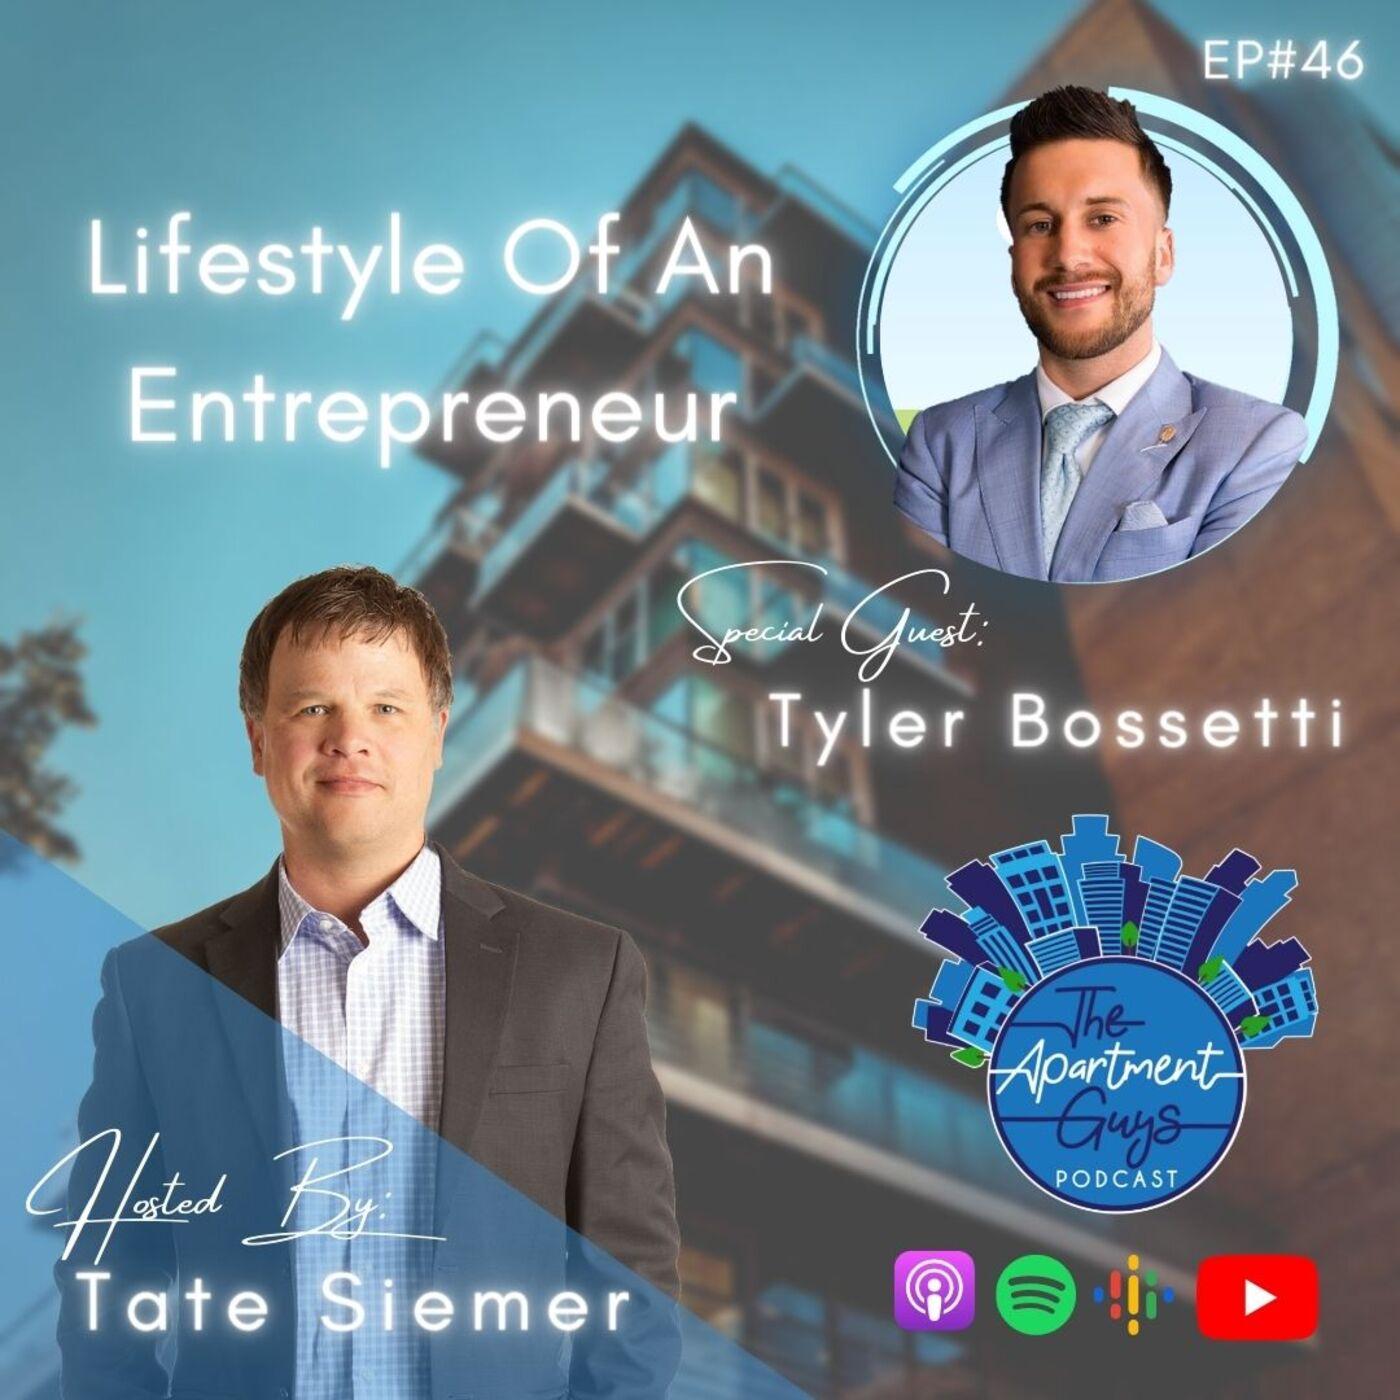 Episode 046: Tyler Bossetti - Lifestyle Of An Entrepreneur